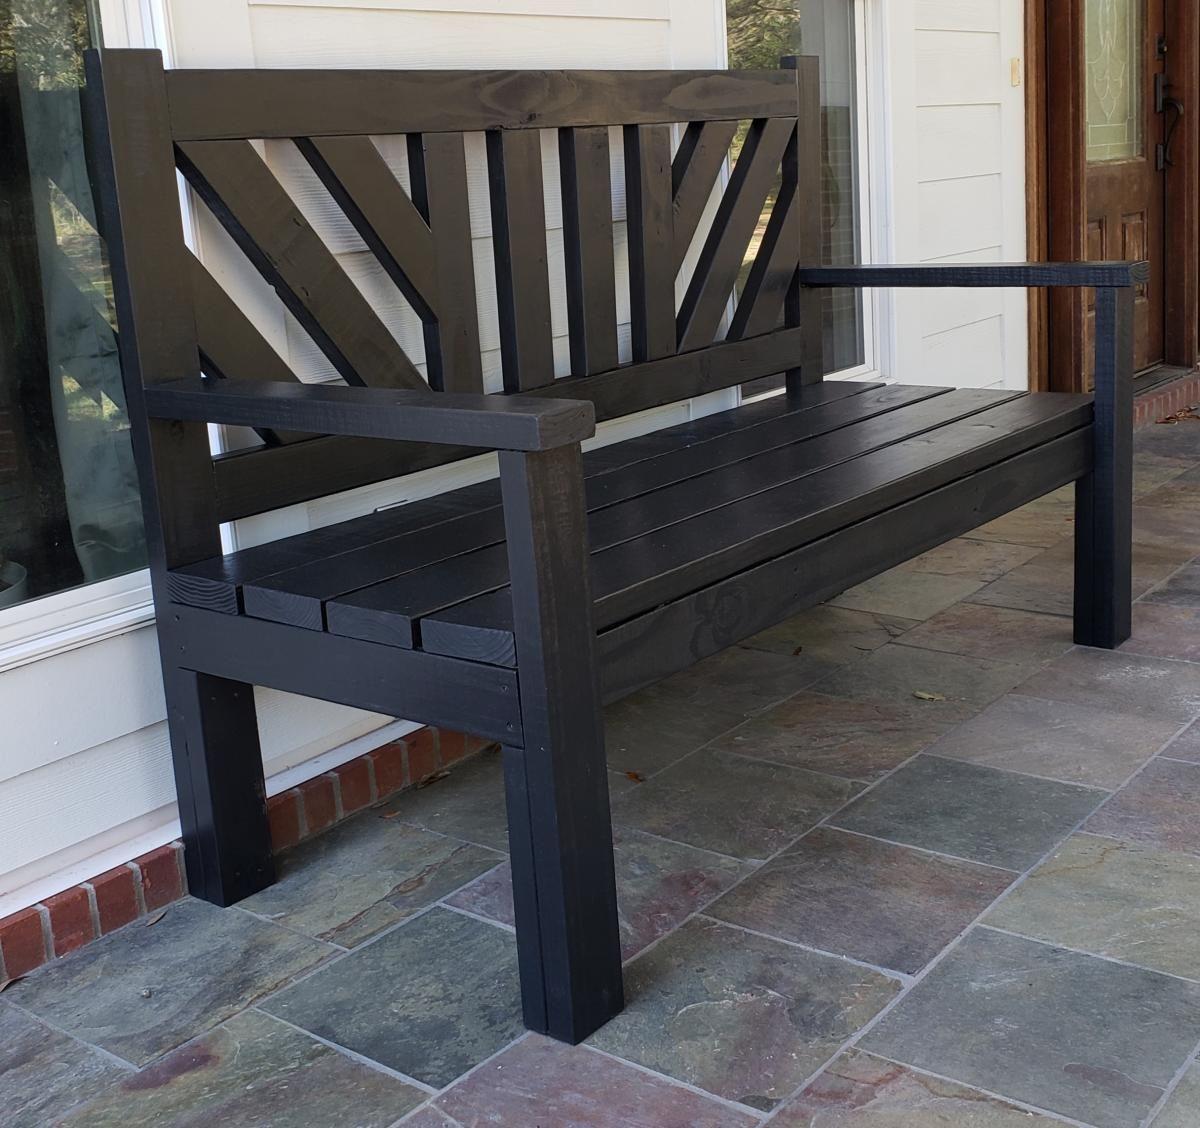 Large Porch Bench Modern Farmhouse Diy Bench Outdoor Wood Bench Outdoor Porch Furniture